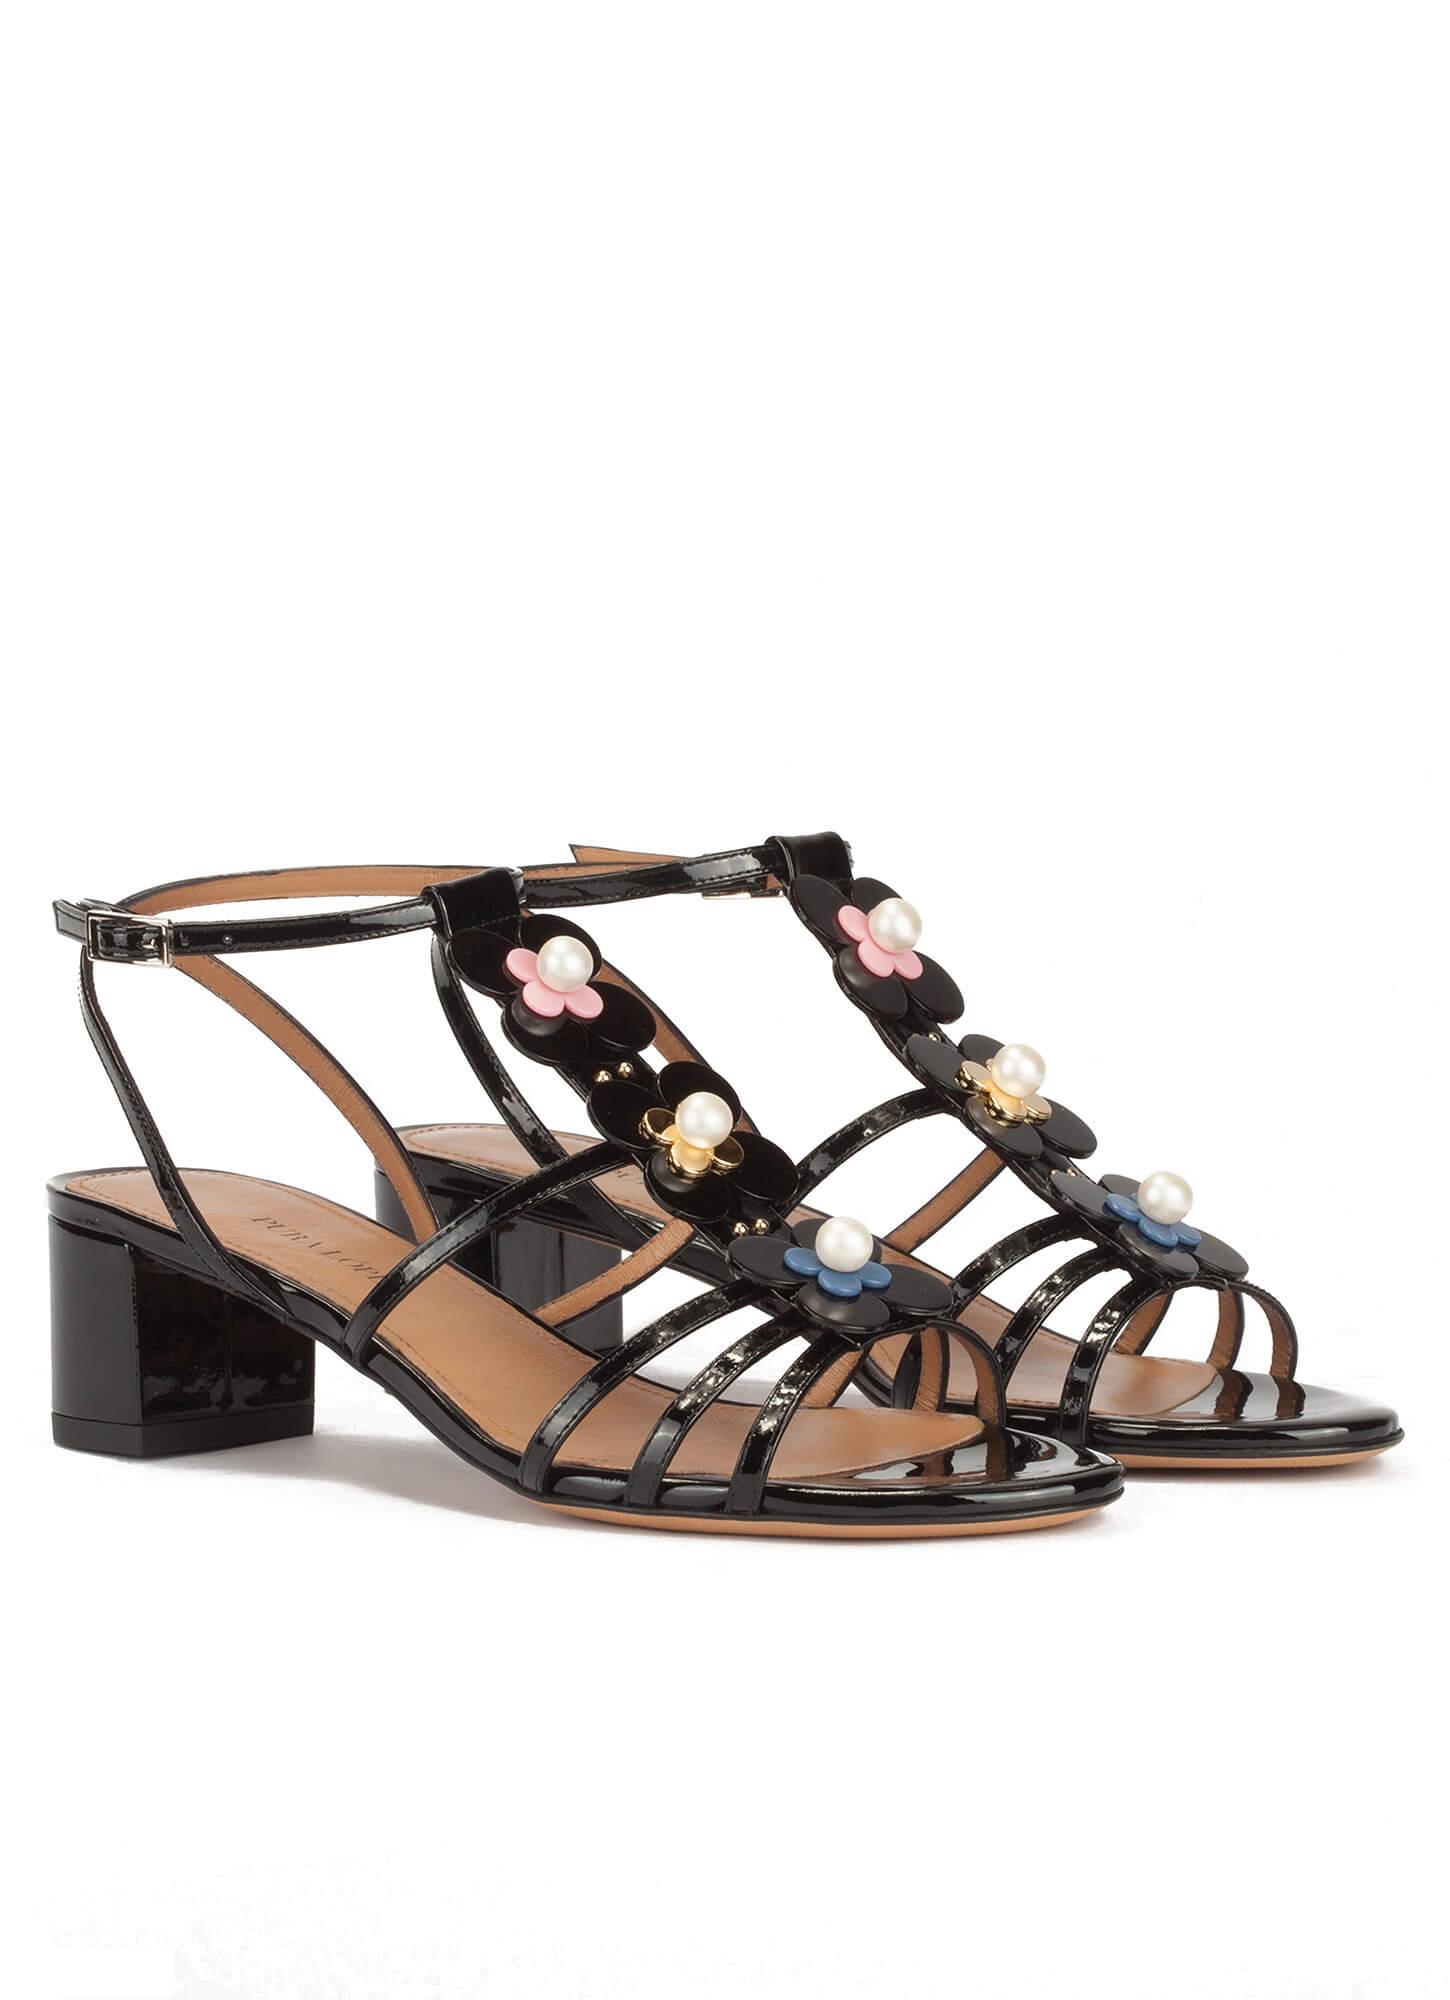 57cf48554b1 Floral-embellished mid block heel sandals in black patent . PURA LOPEZ